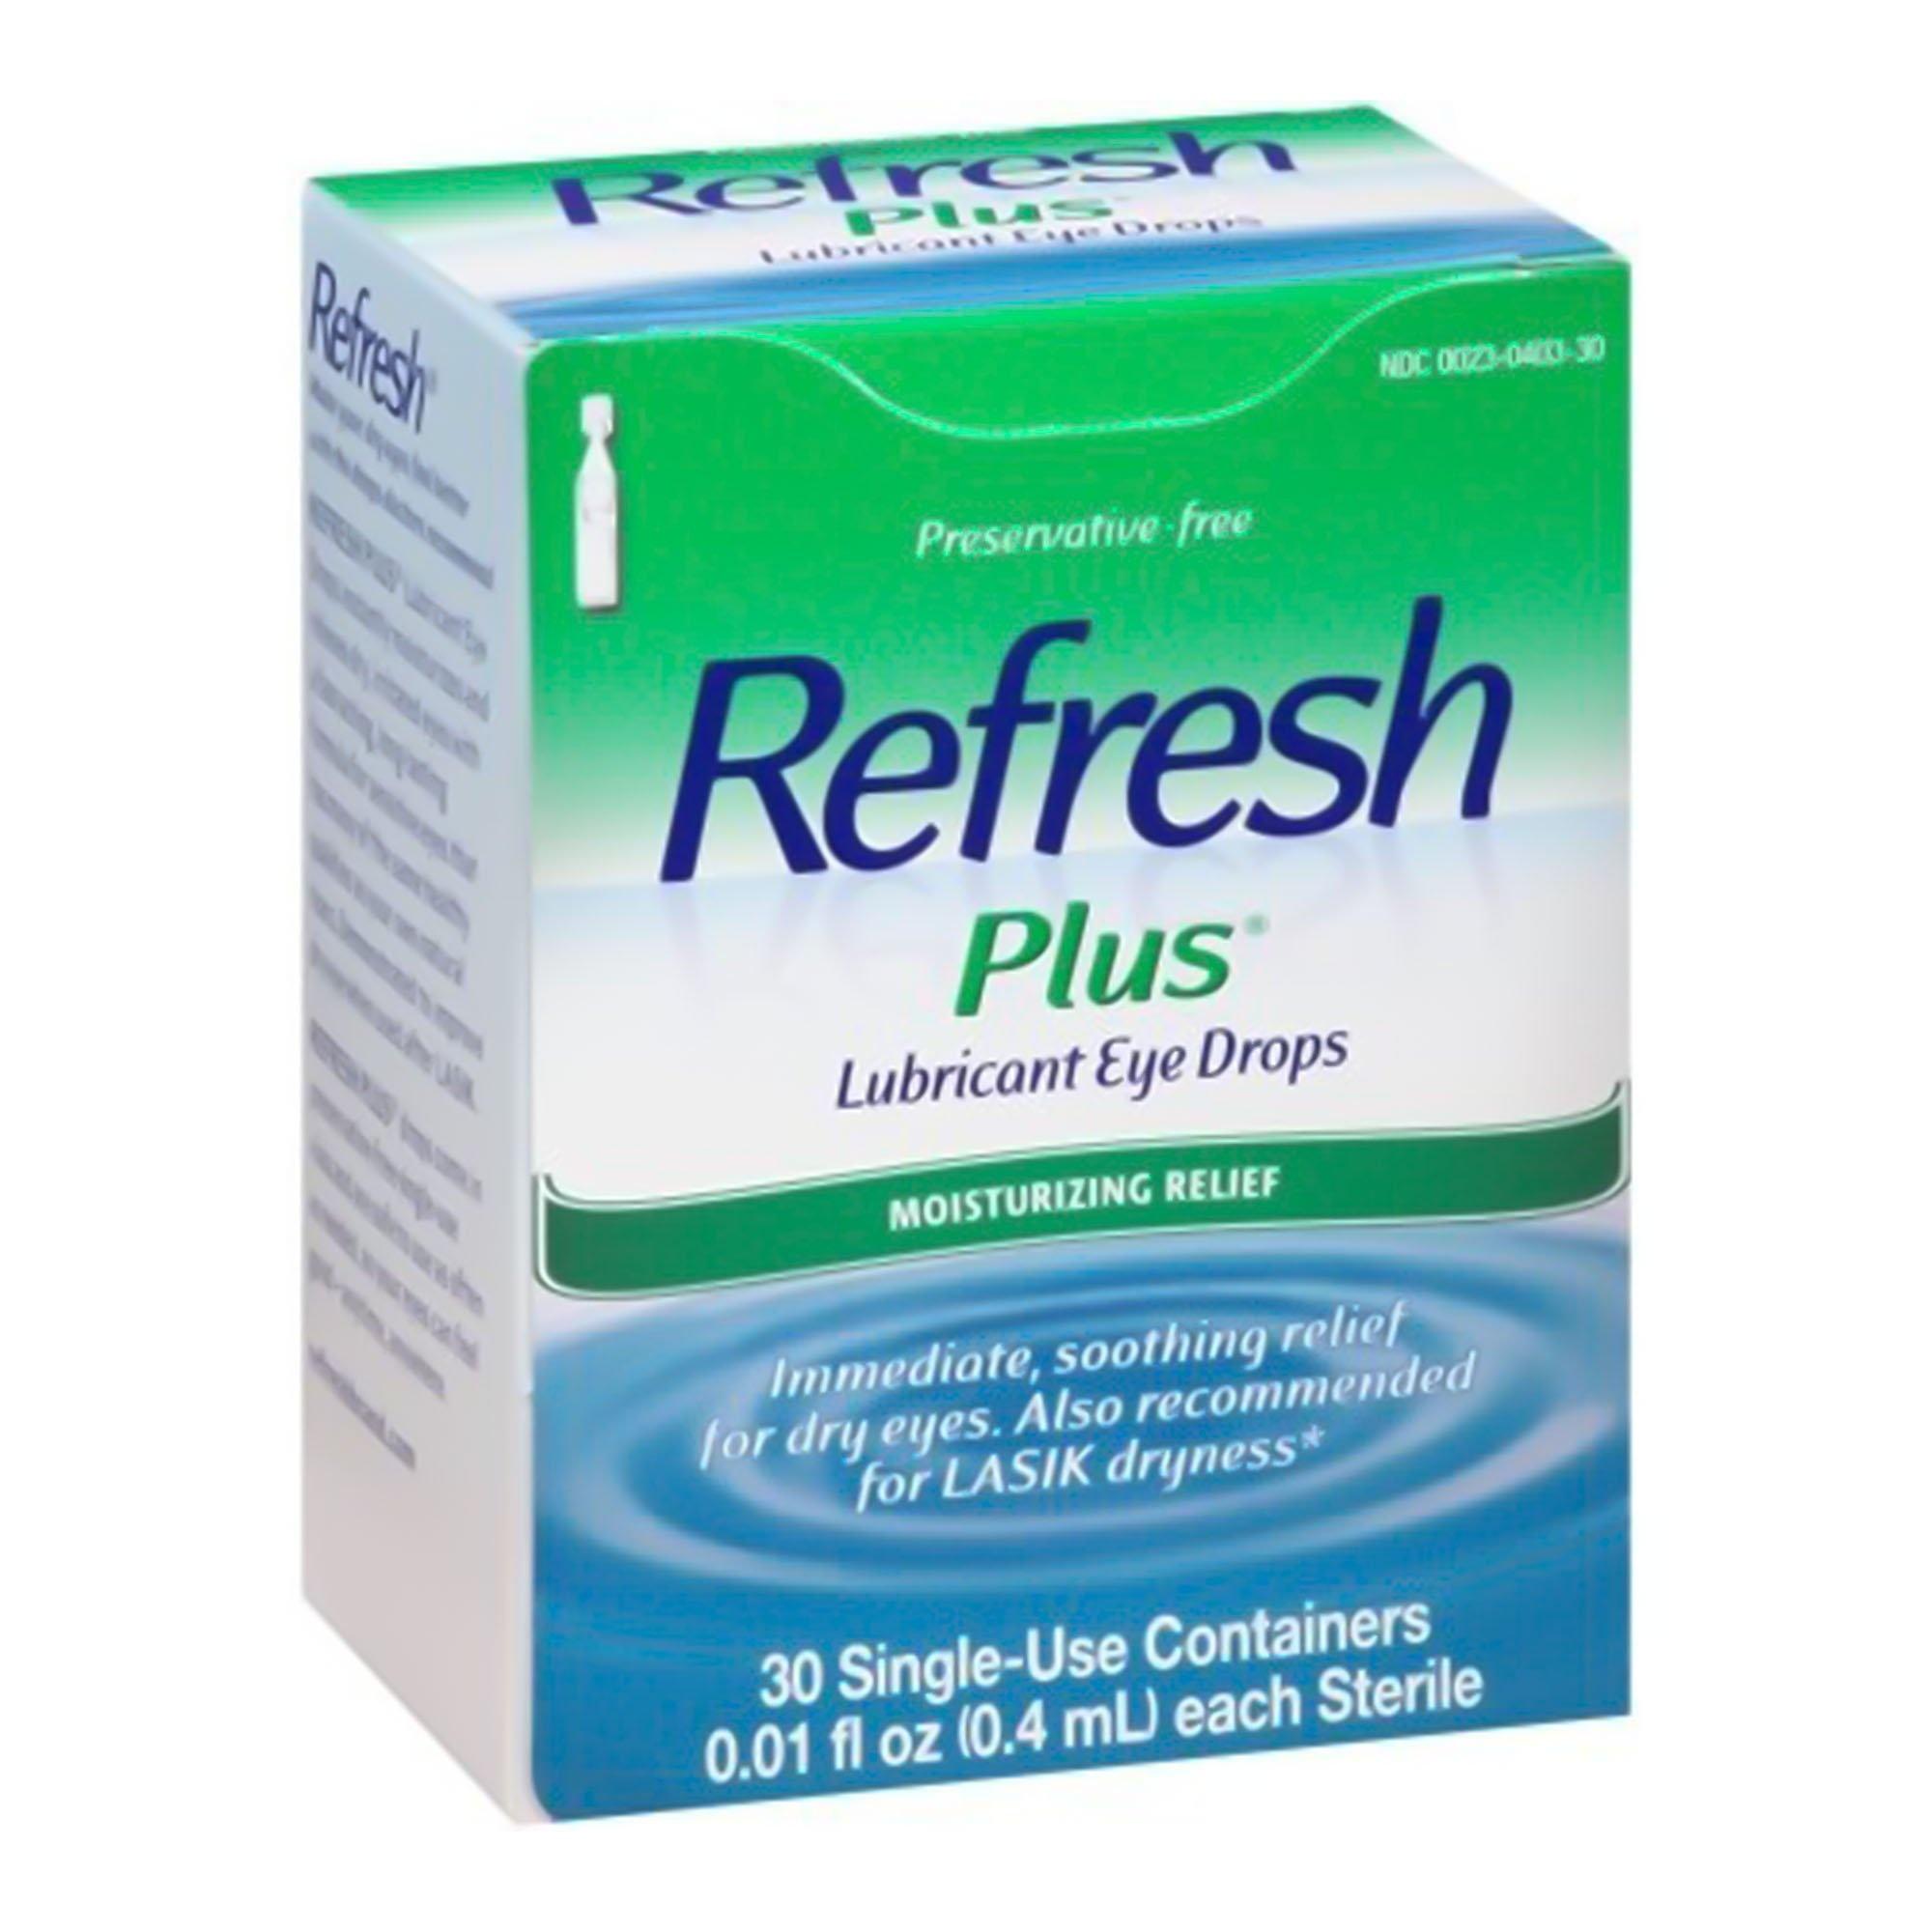 Refresh Plus Lubricant Eye Drops, 00023040330, 0.01 oz. - Box of 30